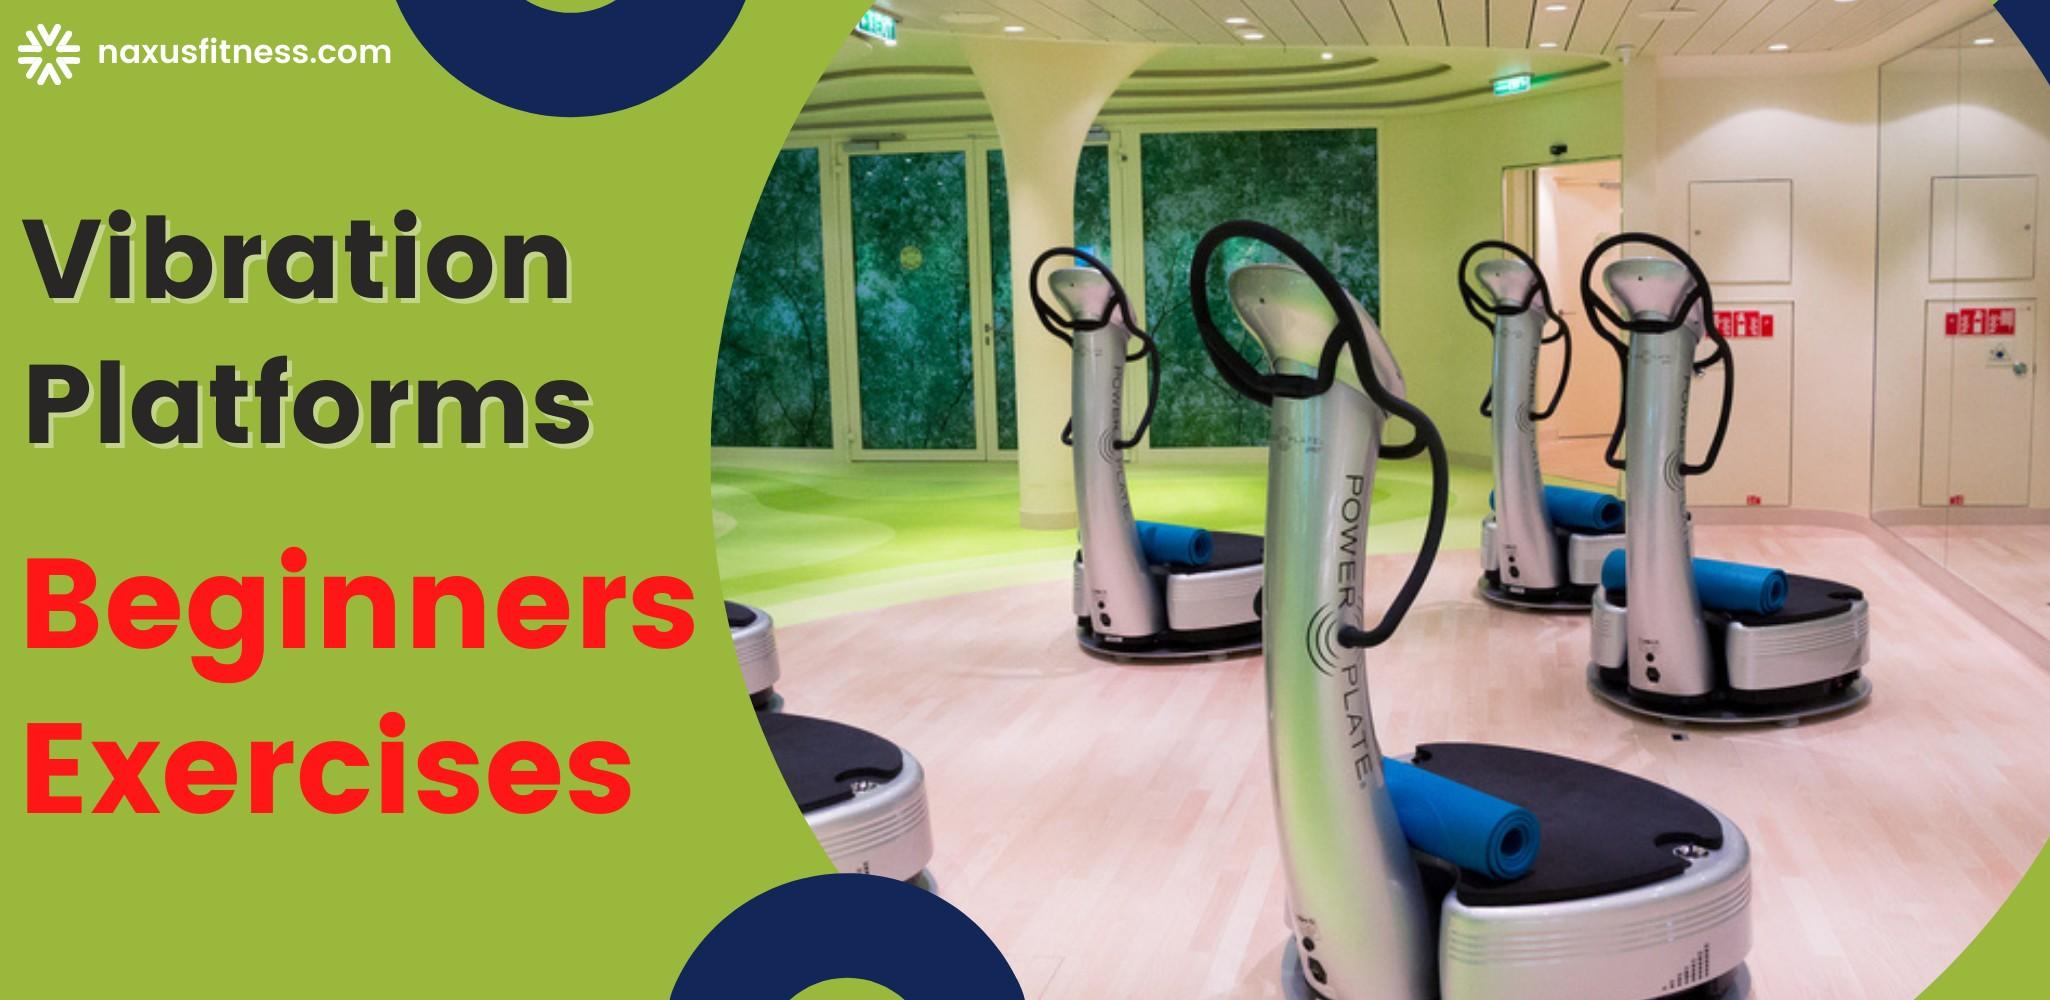 Vibration Plates - The basics and beginner exercises